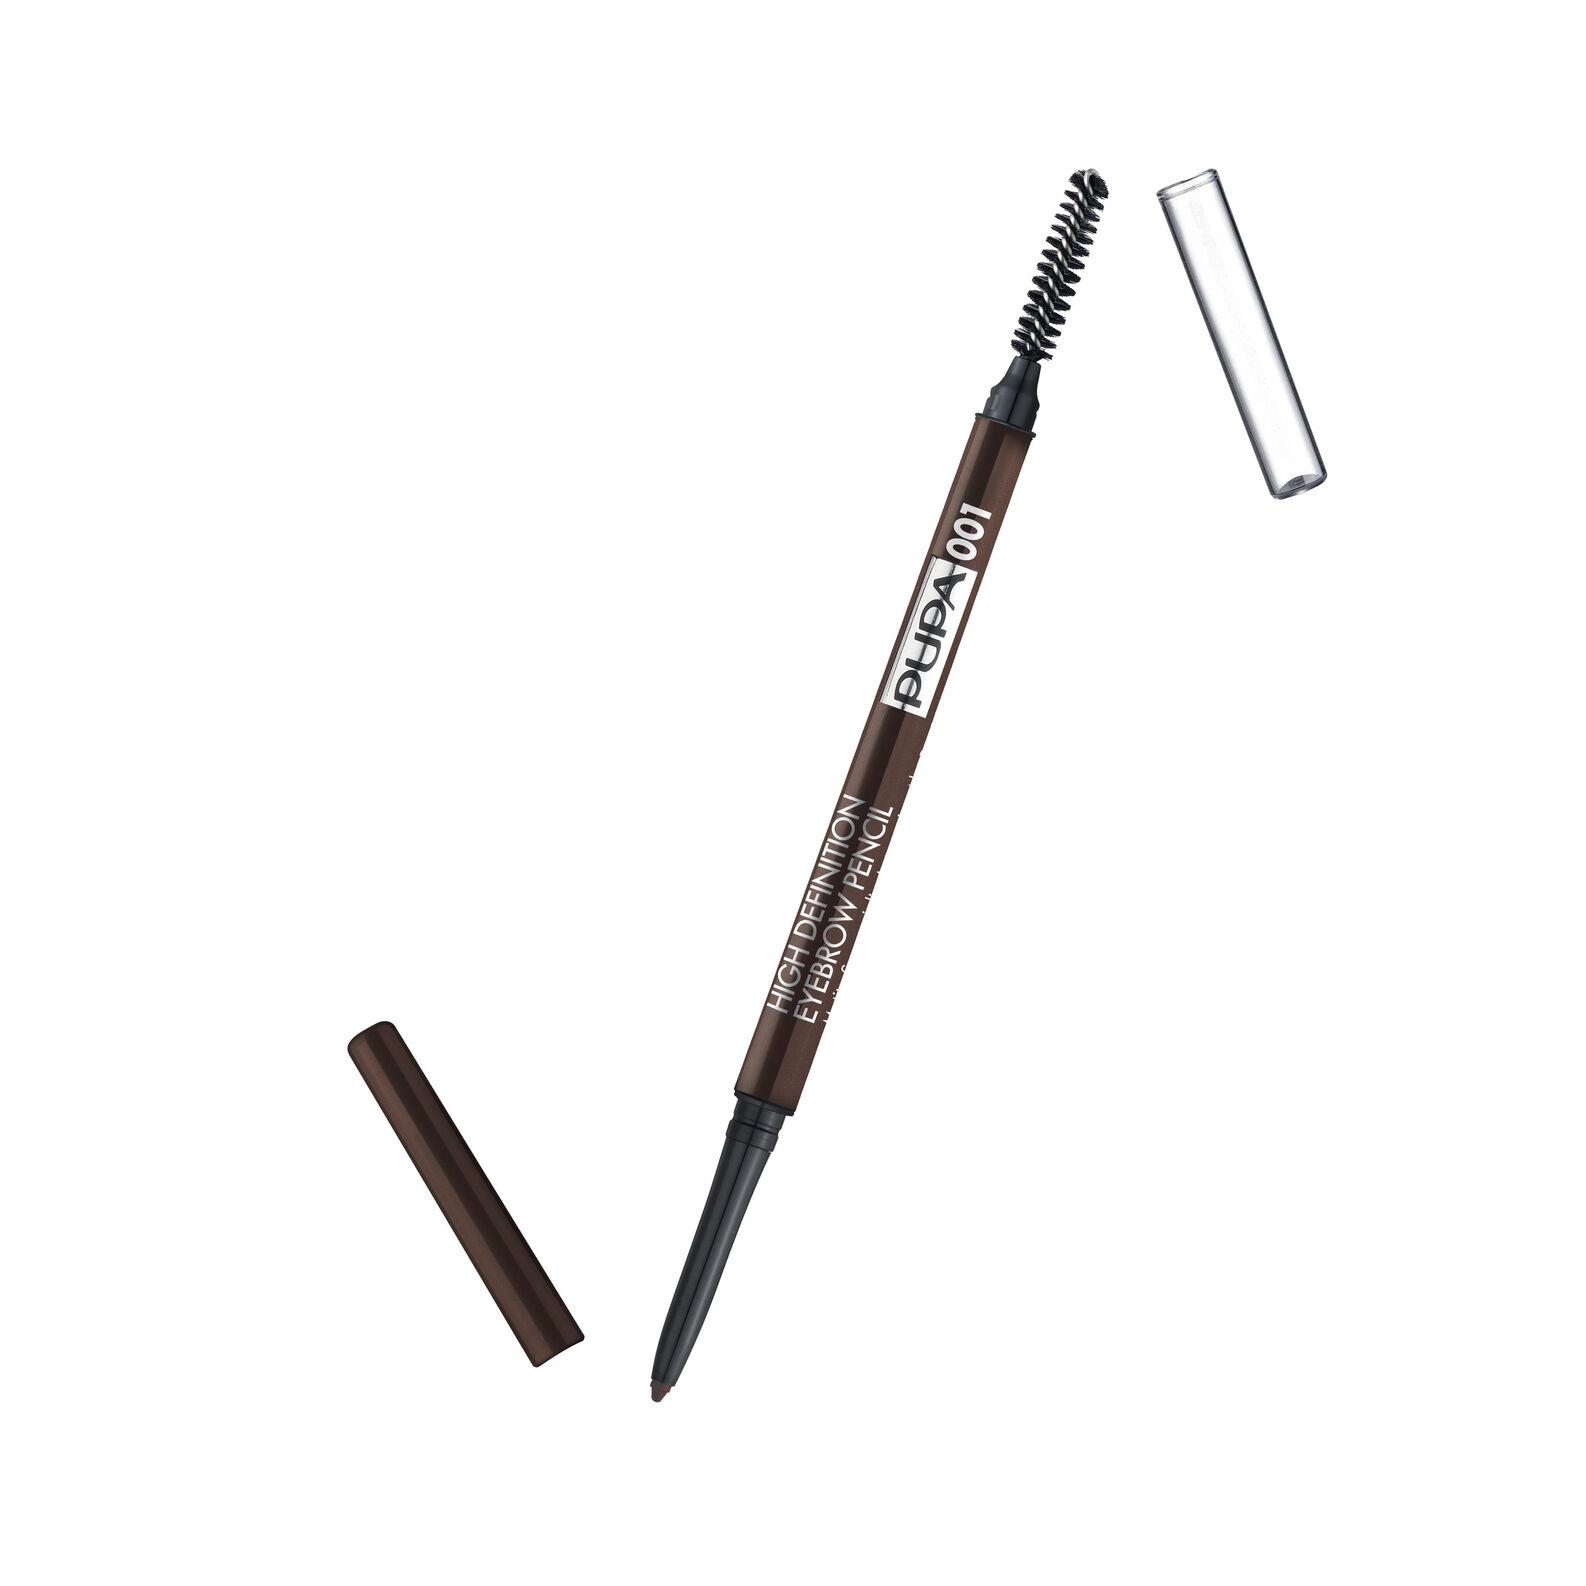 Pupa high definition eyebrow pencil - 01